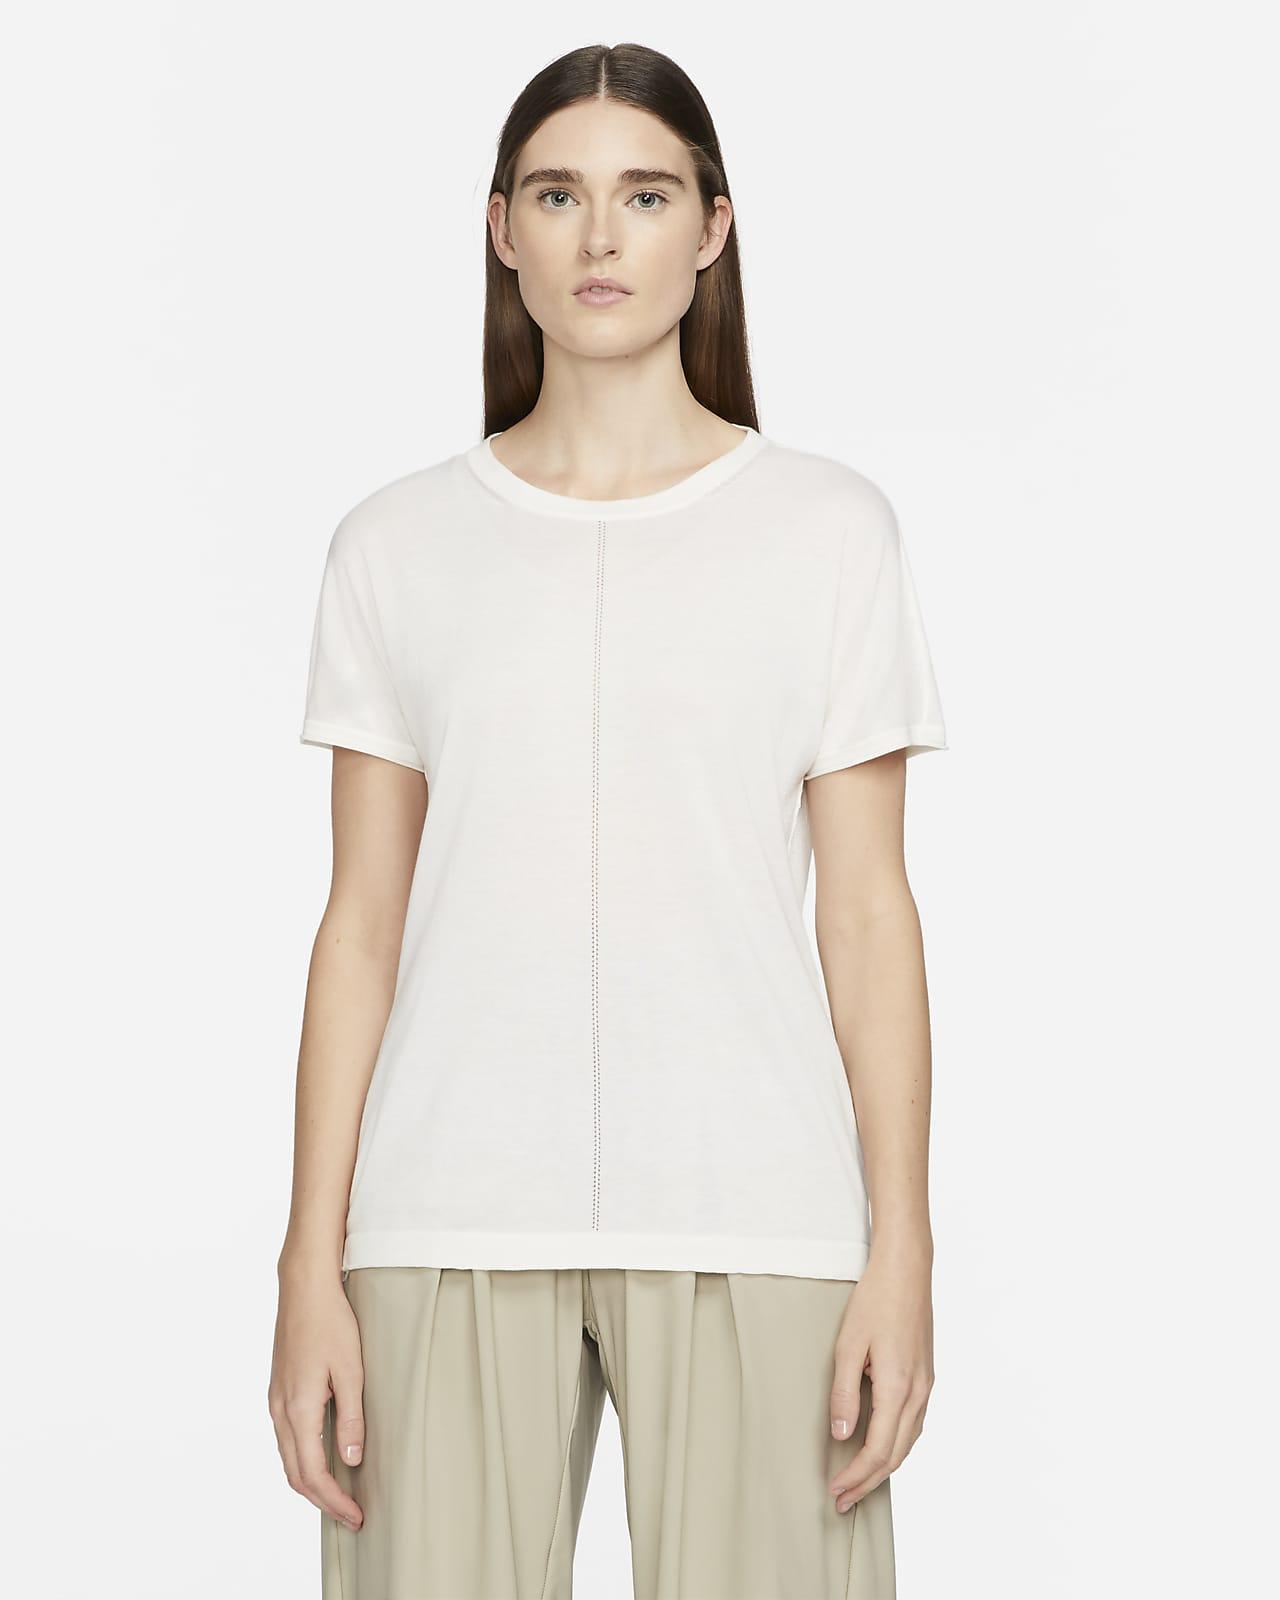 diario Regenerador Molde  Nike ESC Camiseta de manga corta de tejido Knit - Mujer. Nike ES